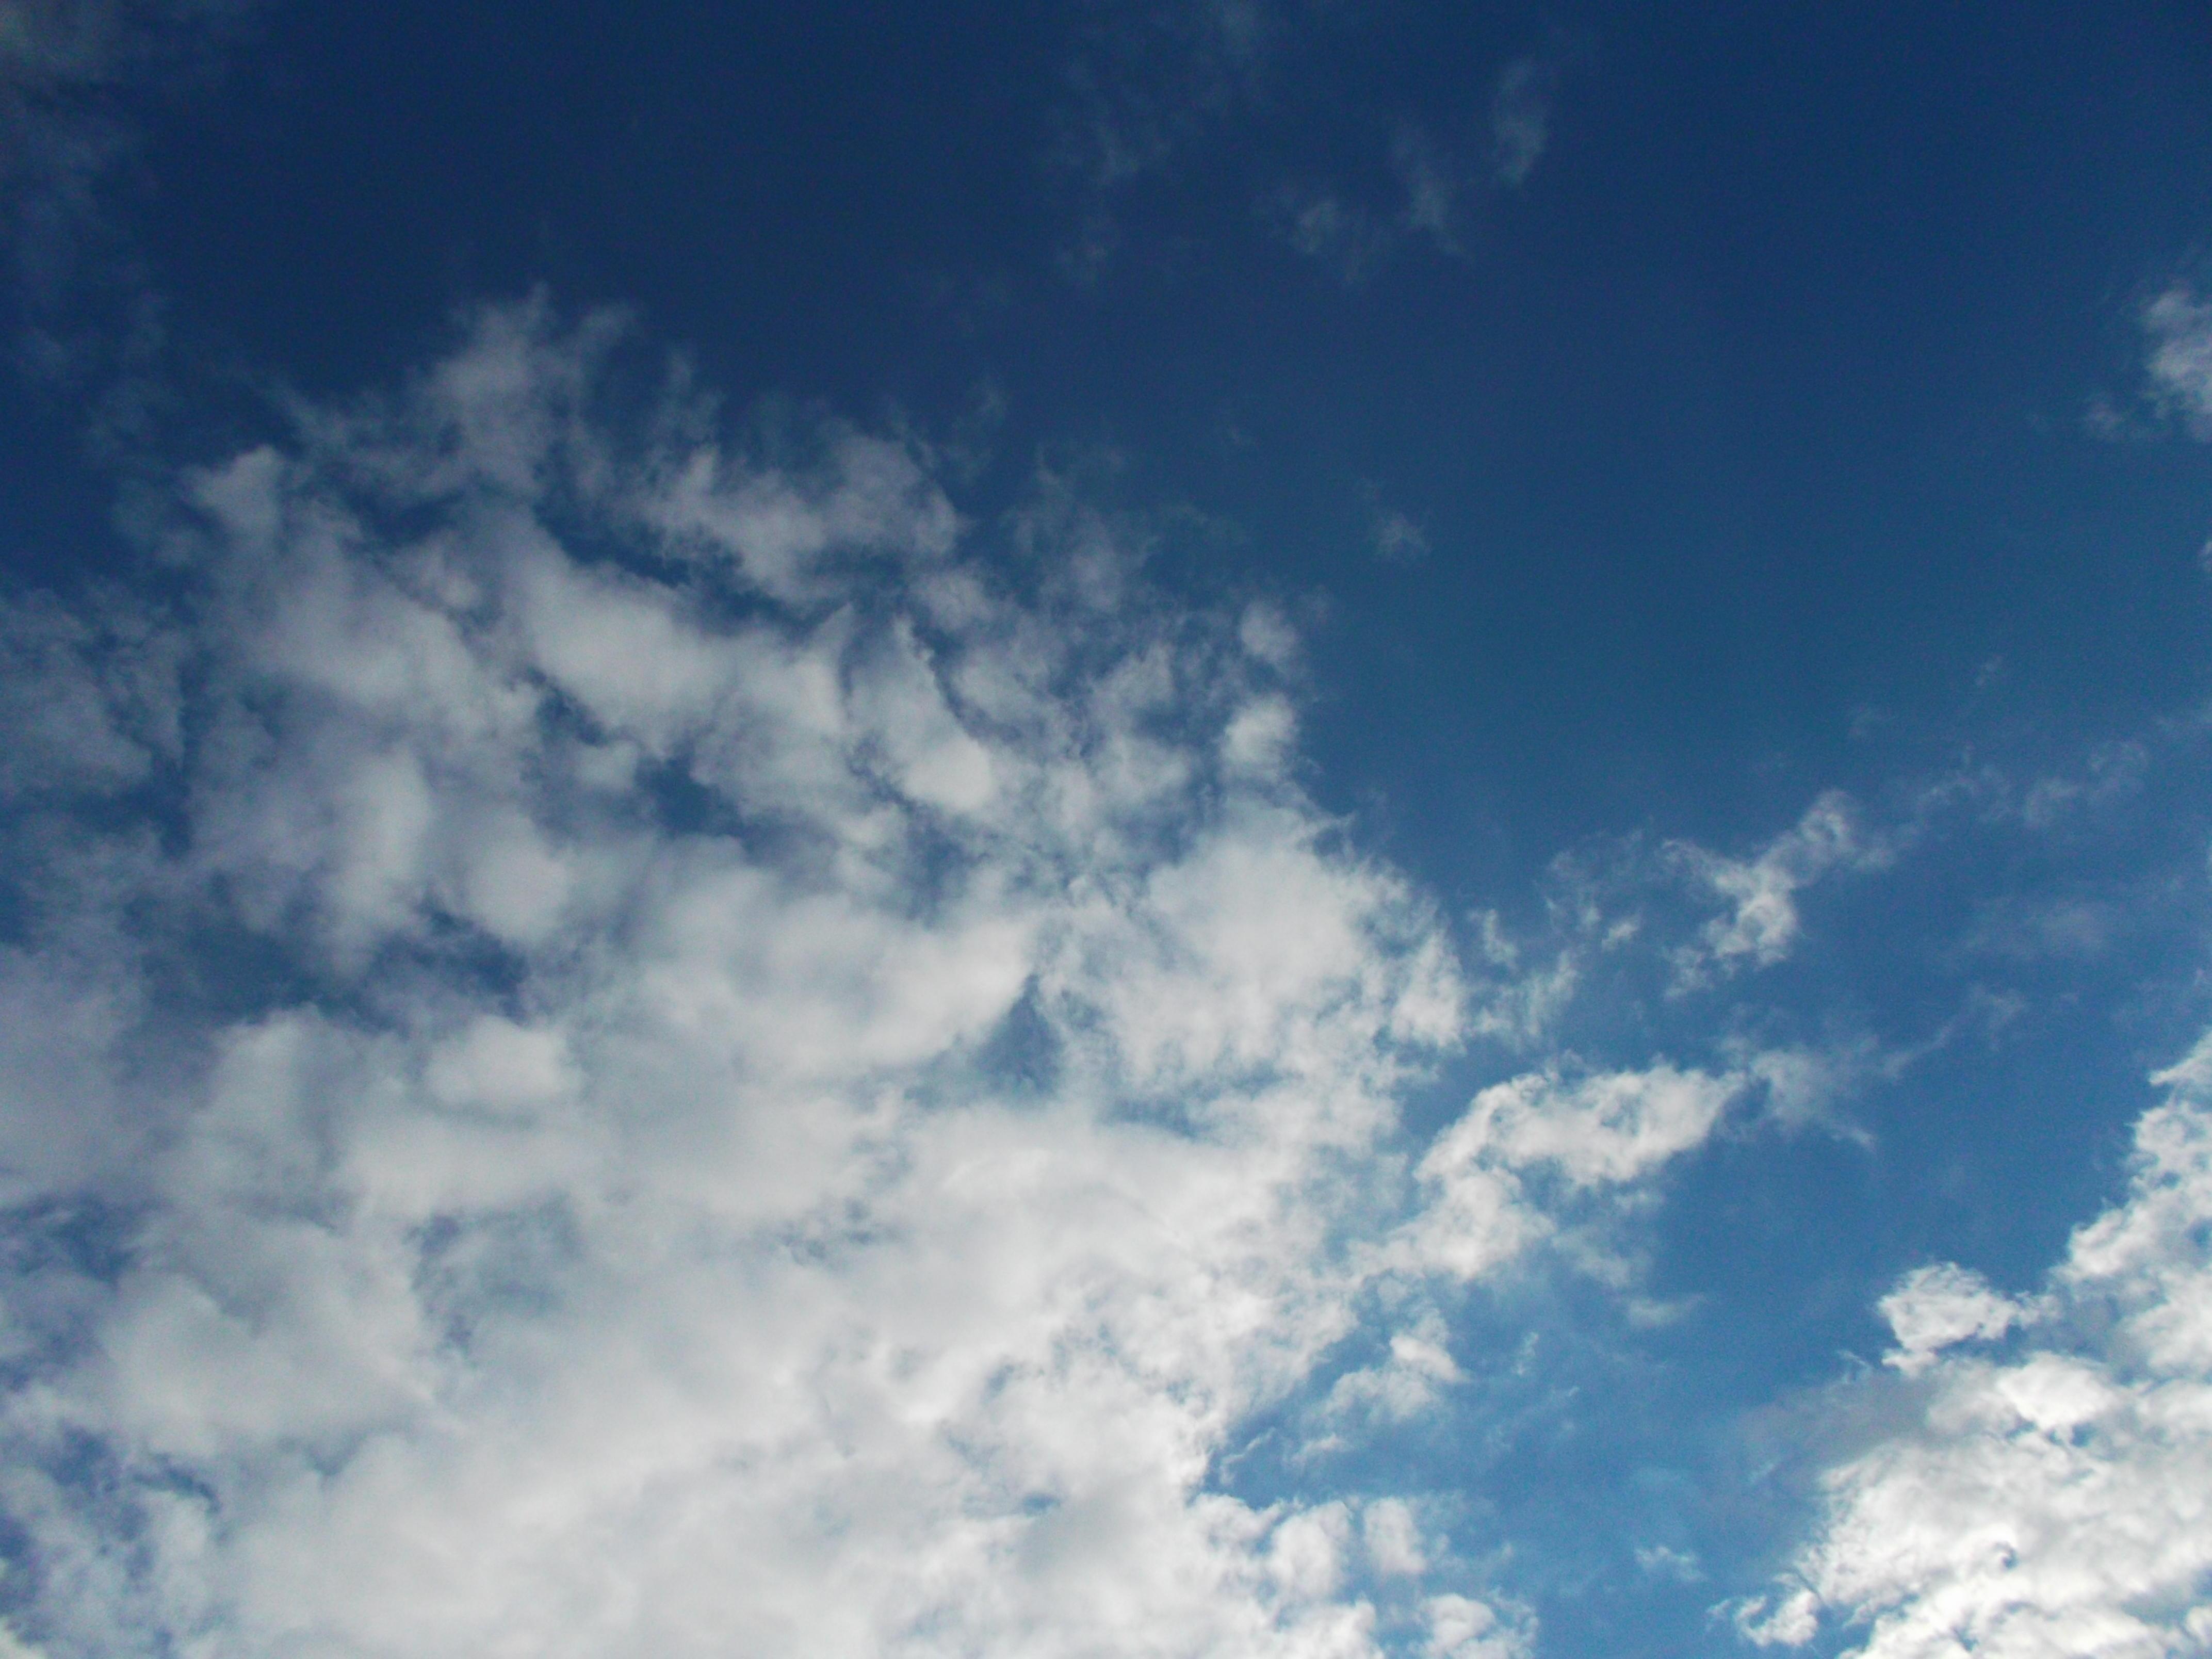 2013-05-24 Longitude -0.371 Latitude 49.182 Altitude 29 Heure 18h31